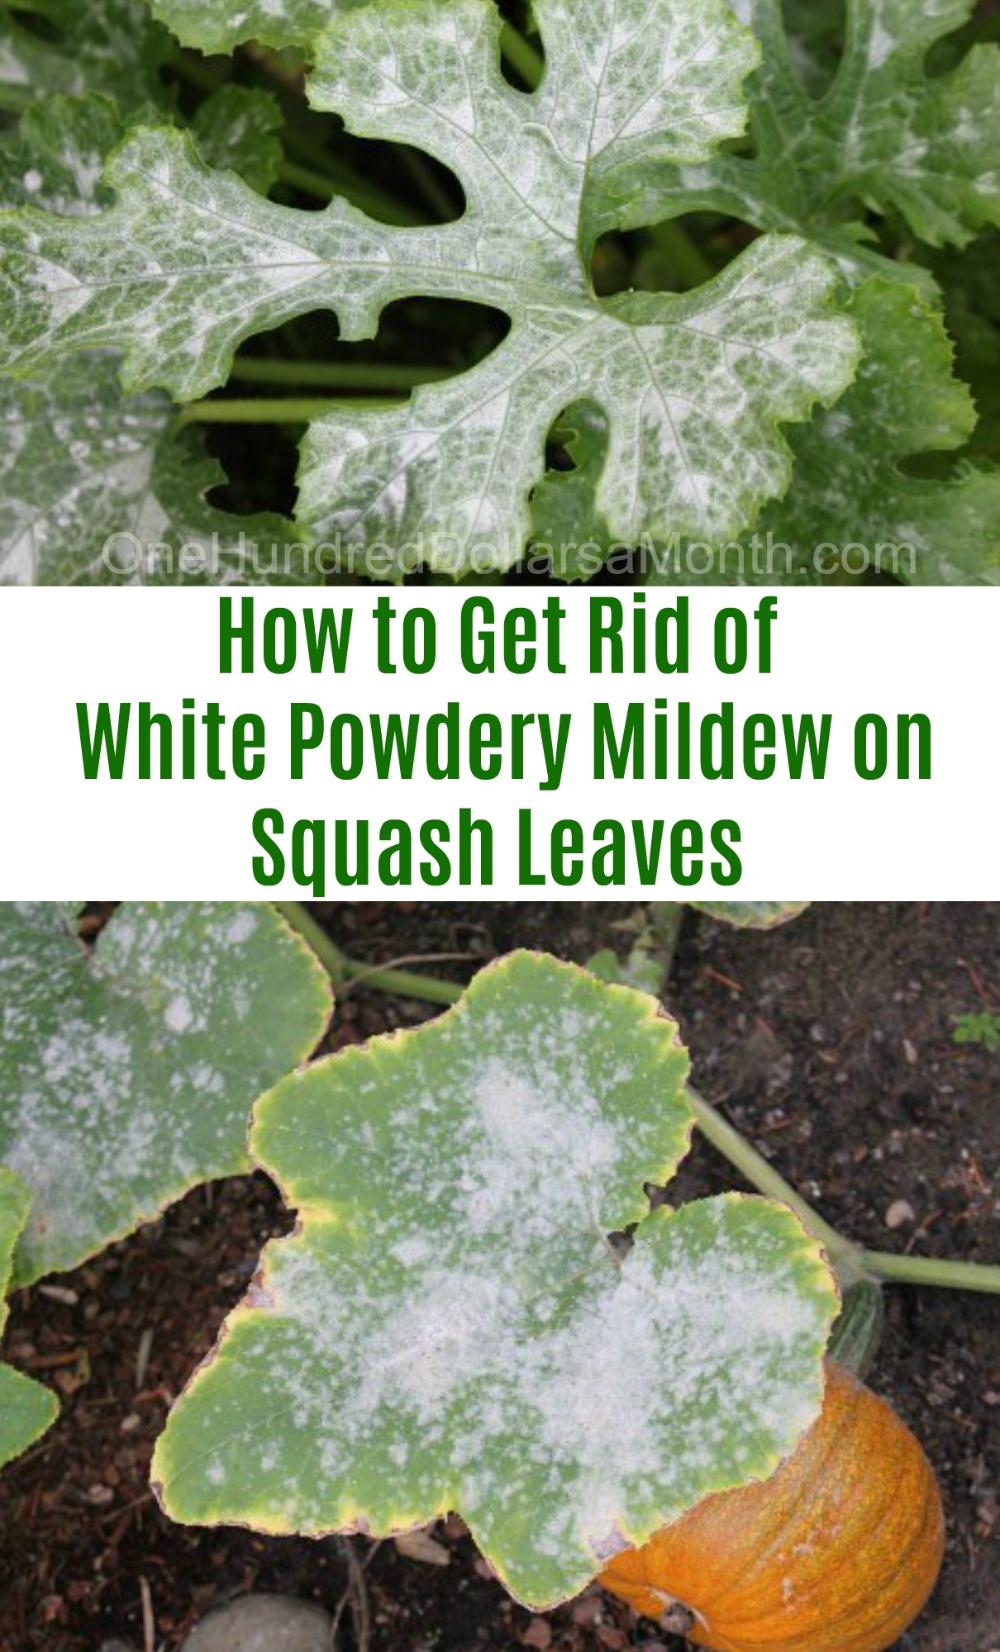 732430b0896411c81ddfaa5ef81a9500 - How To Get Rid Of Mildew In Garden Soil